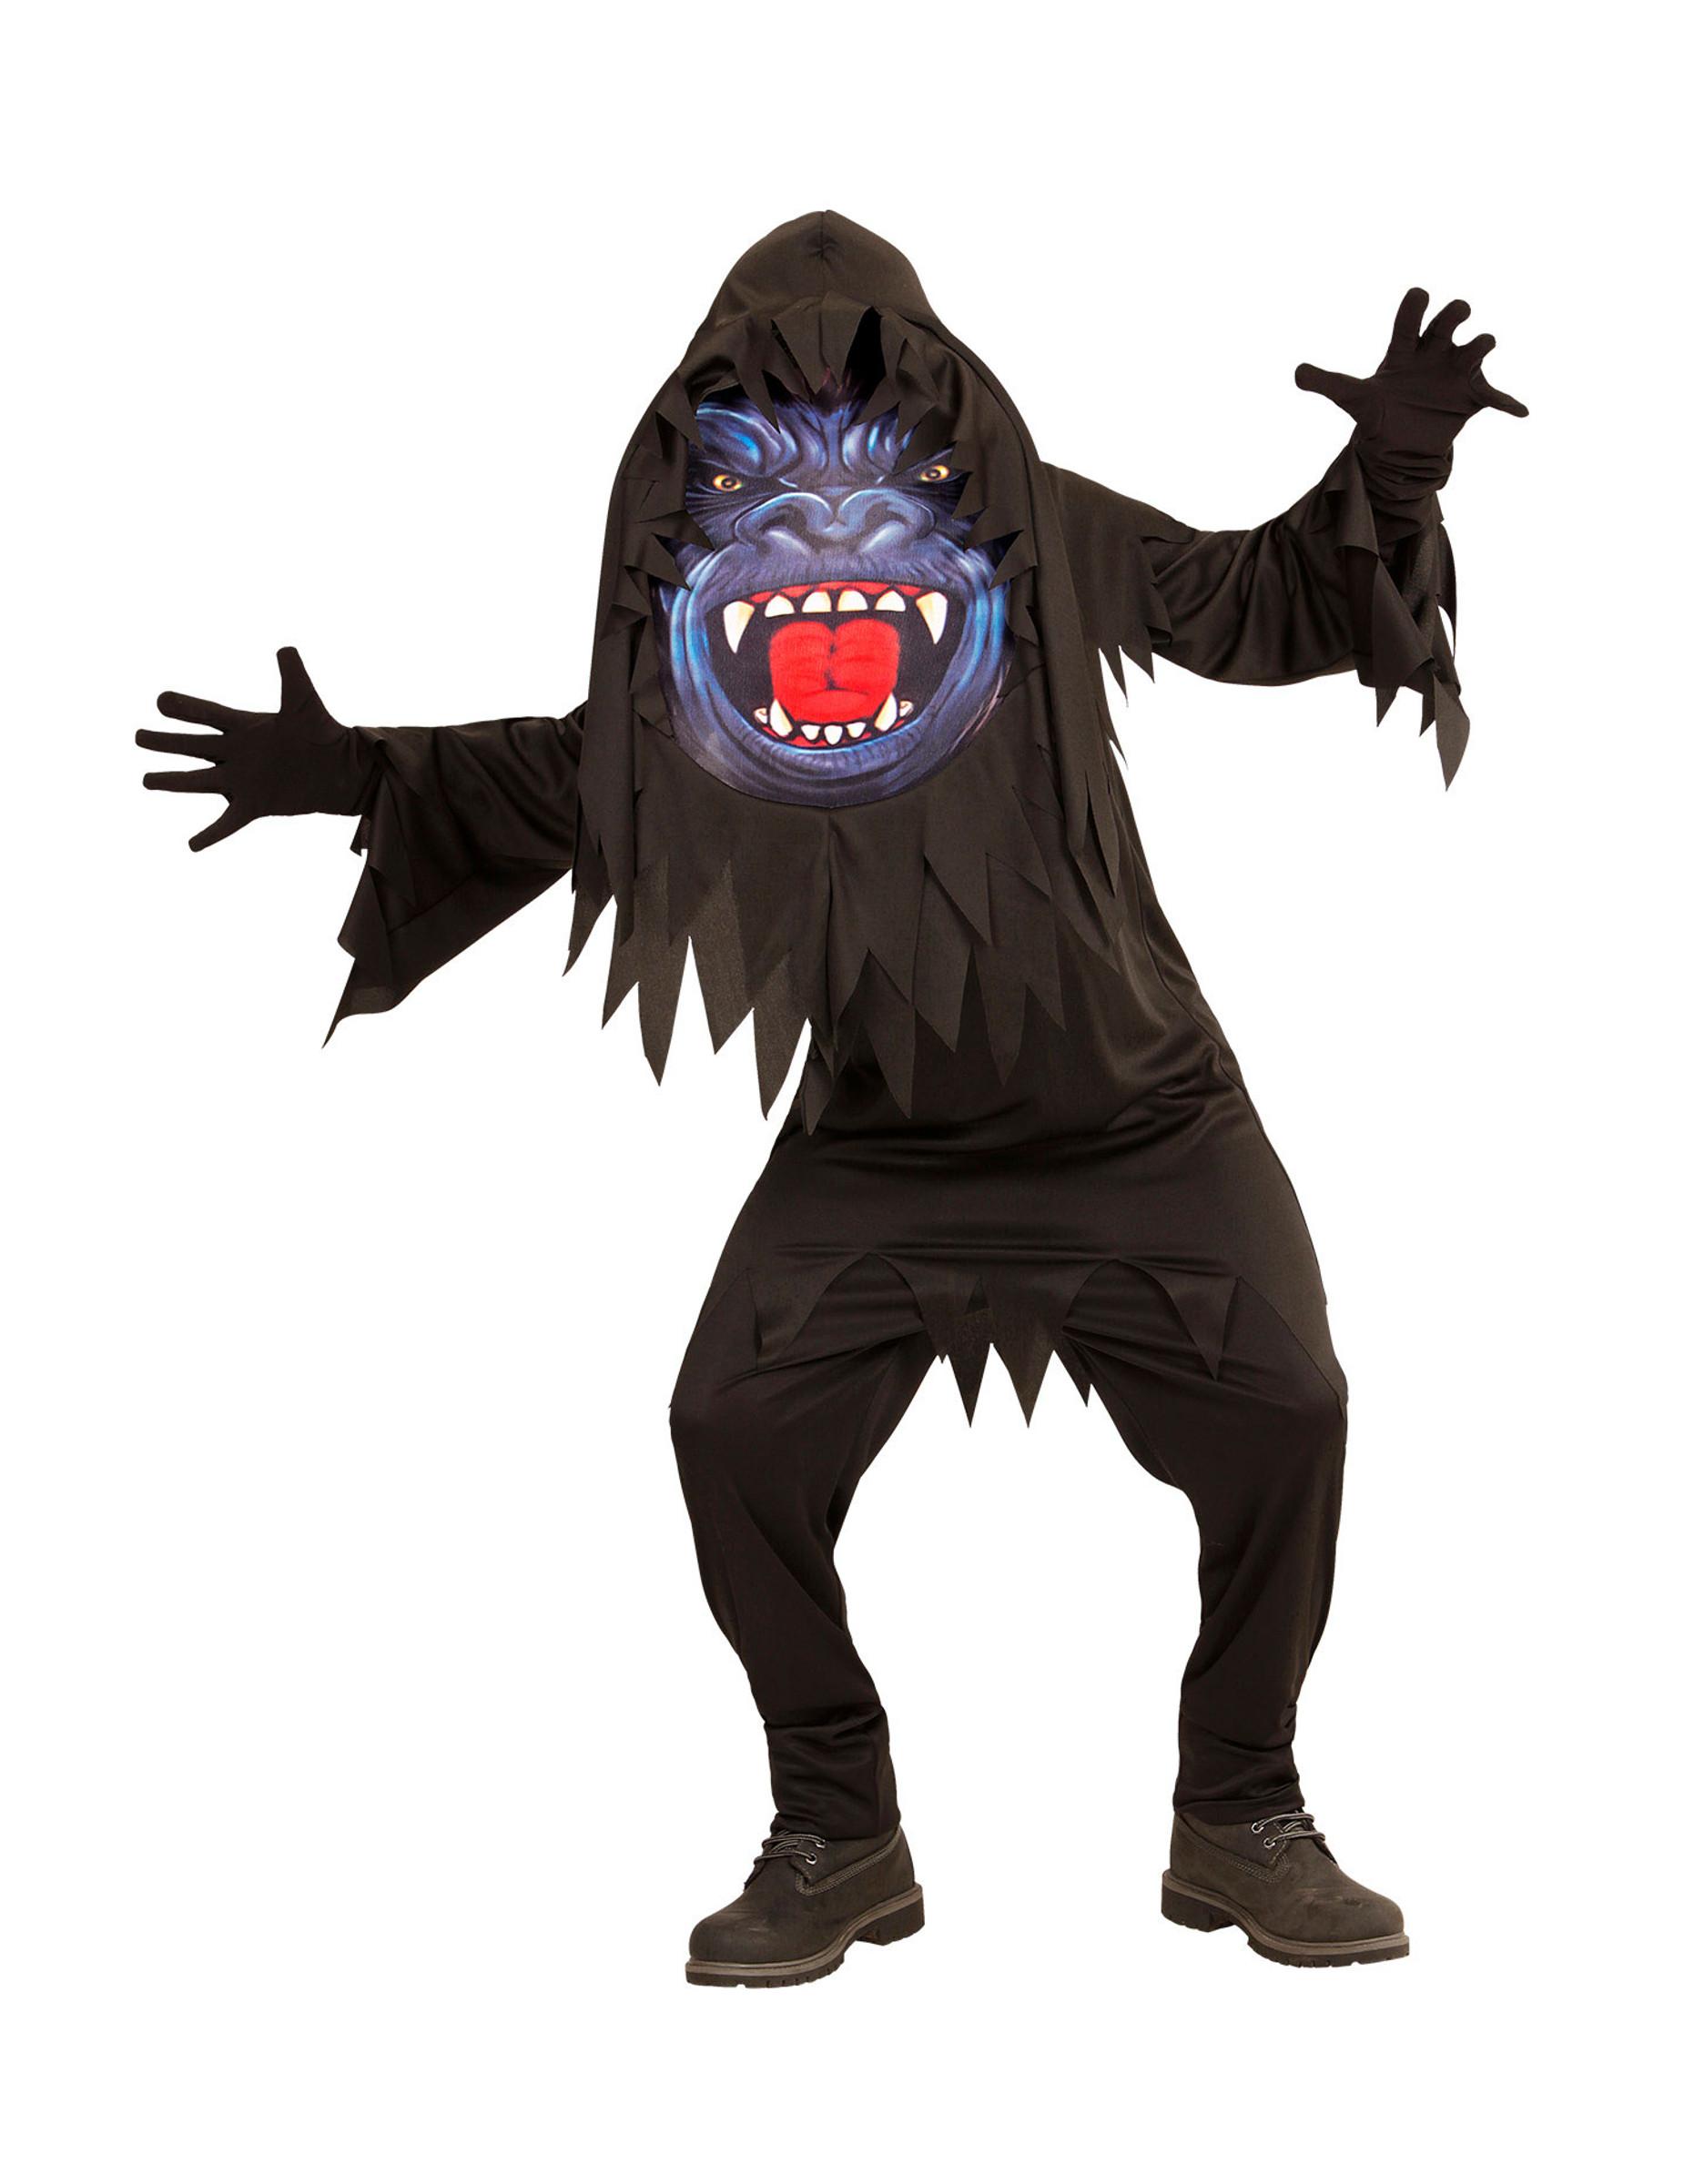 116980eca4e Gorilla kostume til voksne, køb Kostumer til børn på Vegaoo.dk